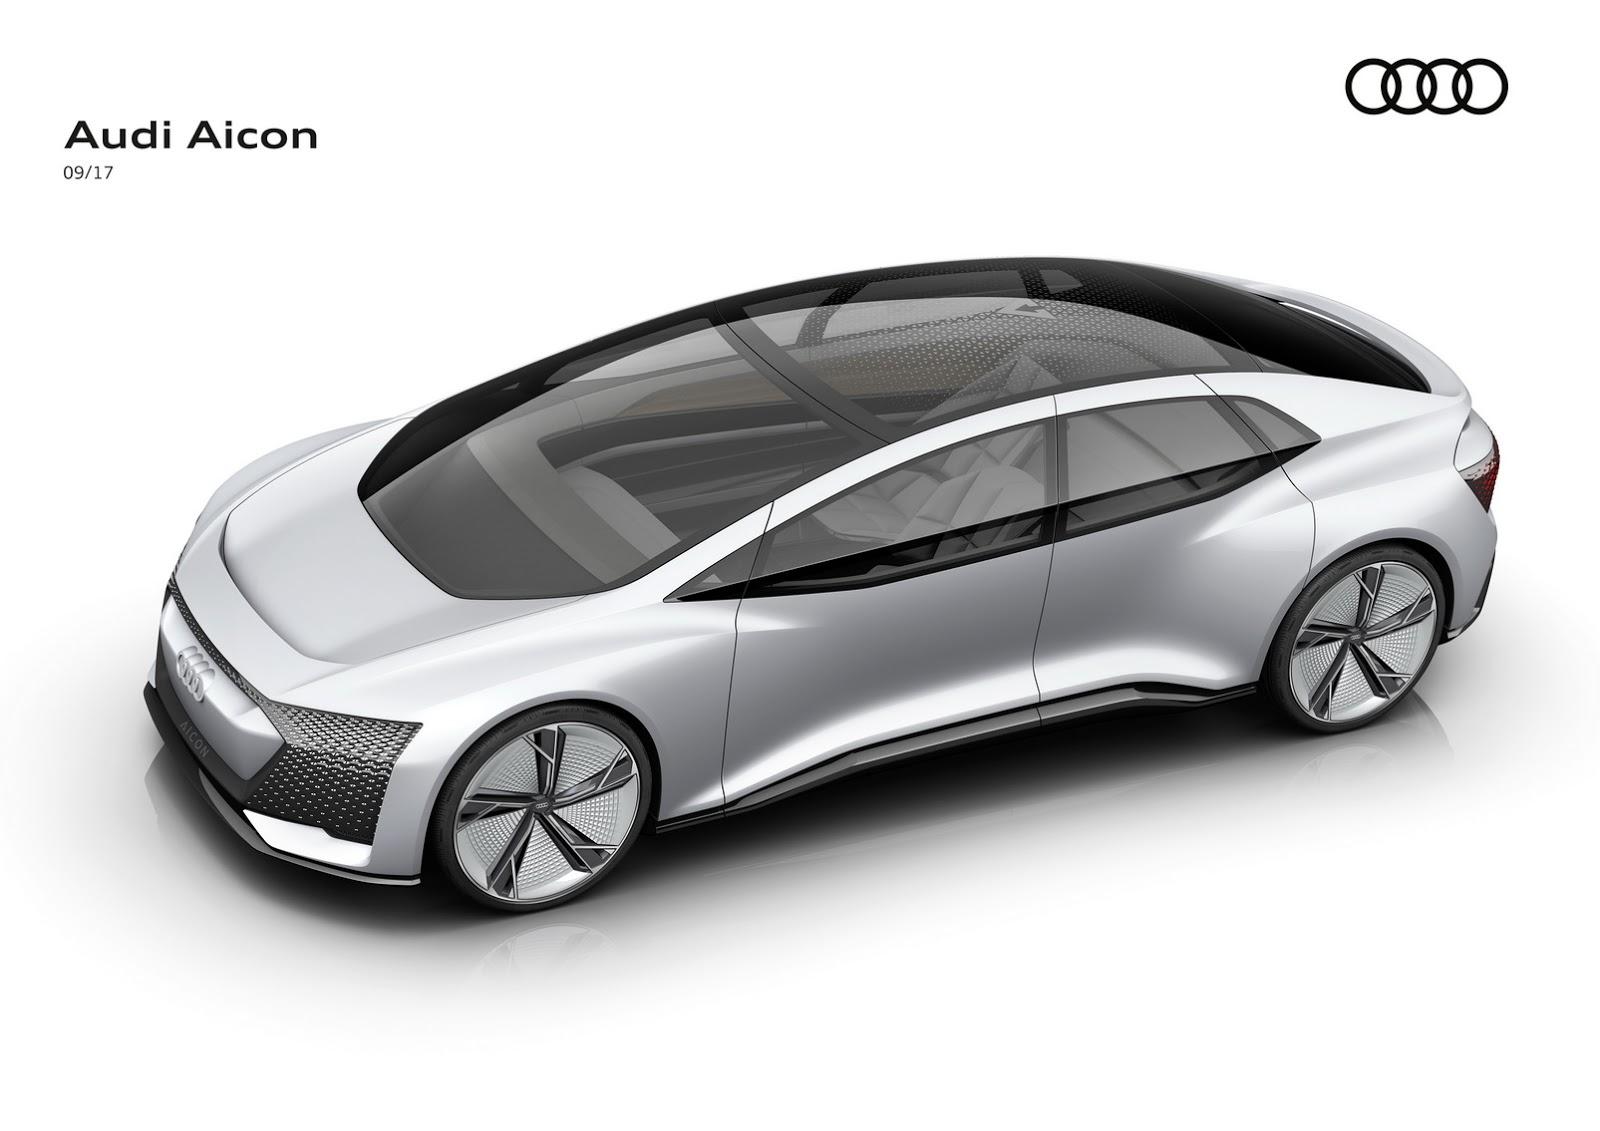 audi aicon concept is another autonomous ev, this time without a